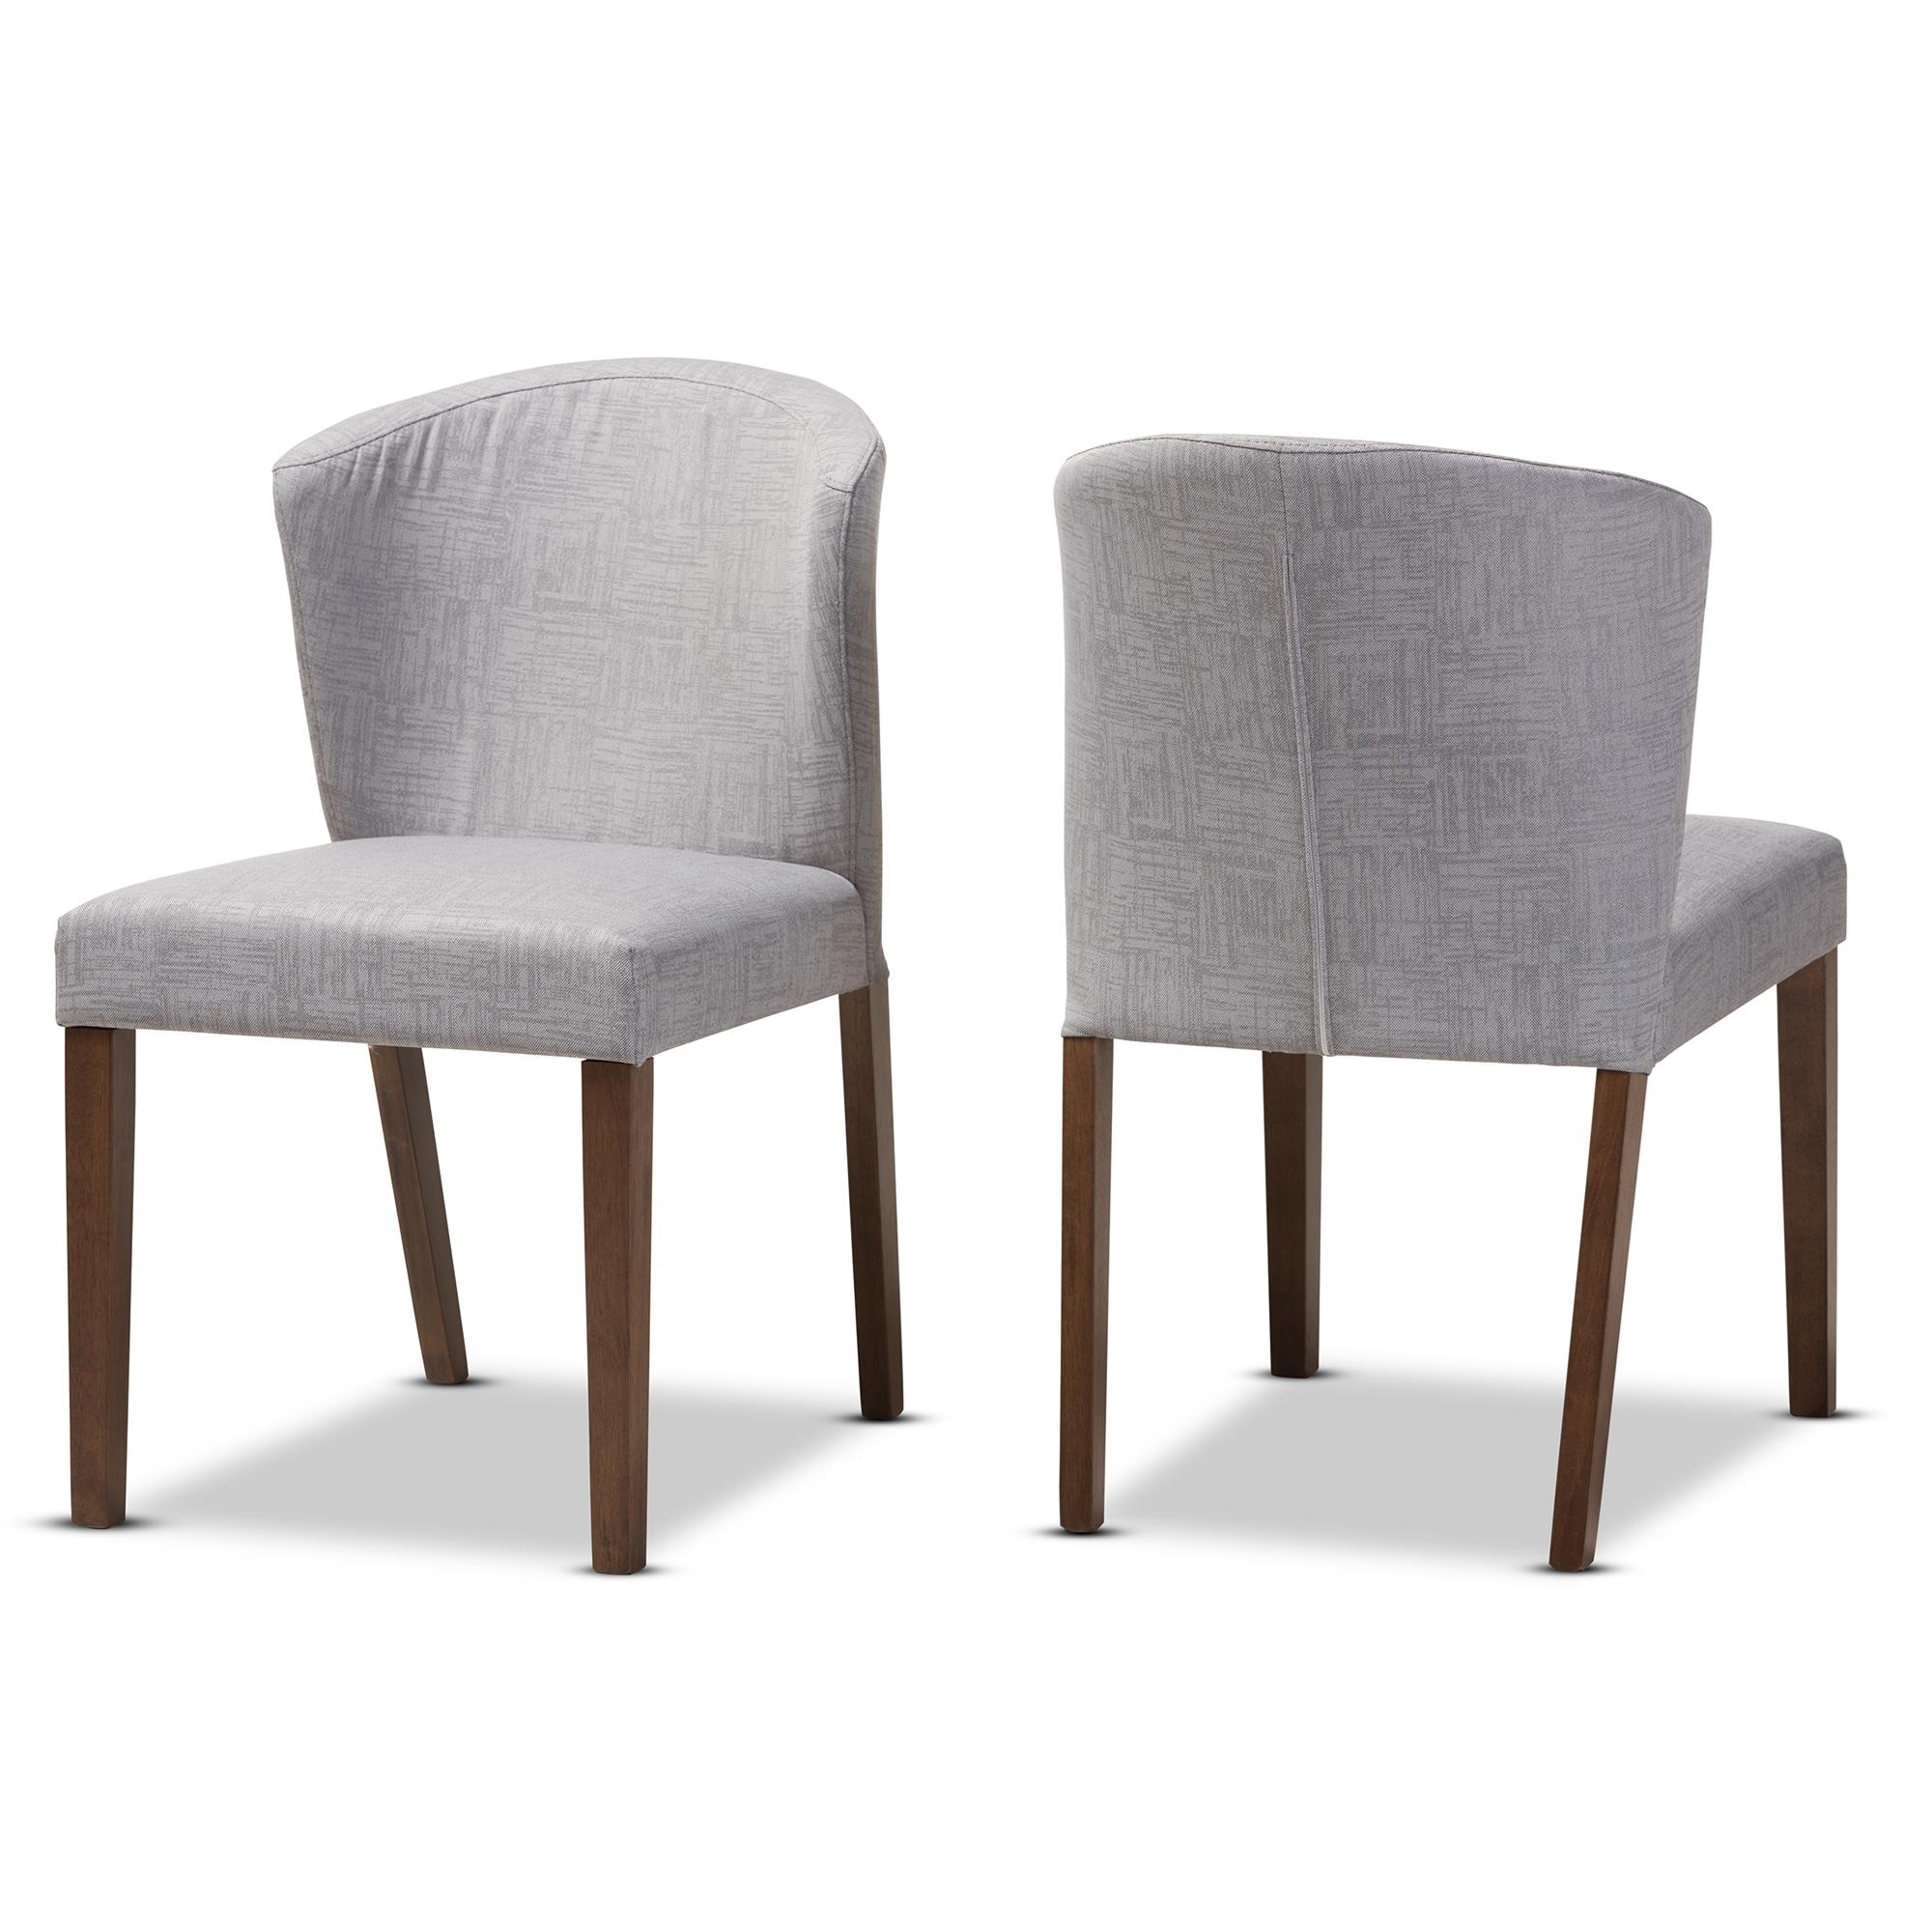 Baxton Studio Cassie Mid Century Modern Walnut Wood Light Grey Fabric Dining  Chair Baxton Studio